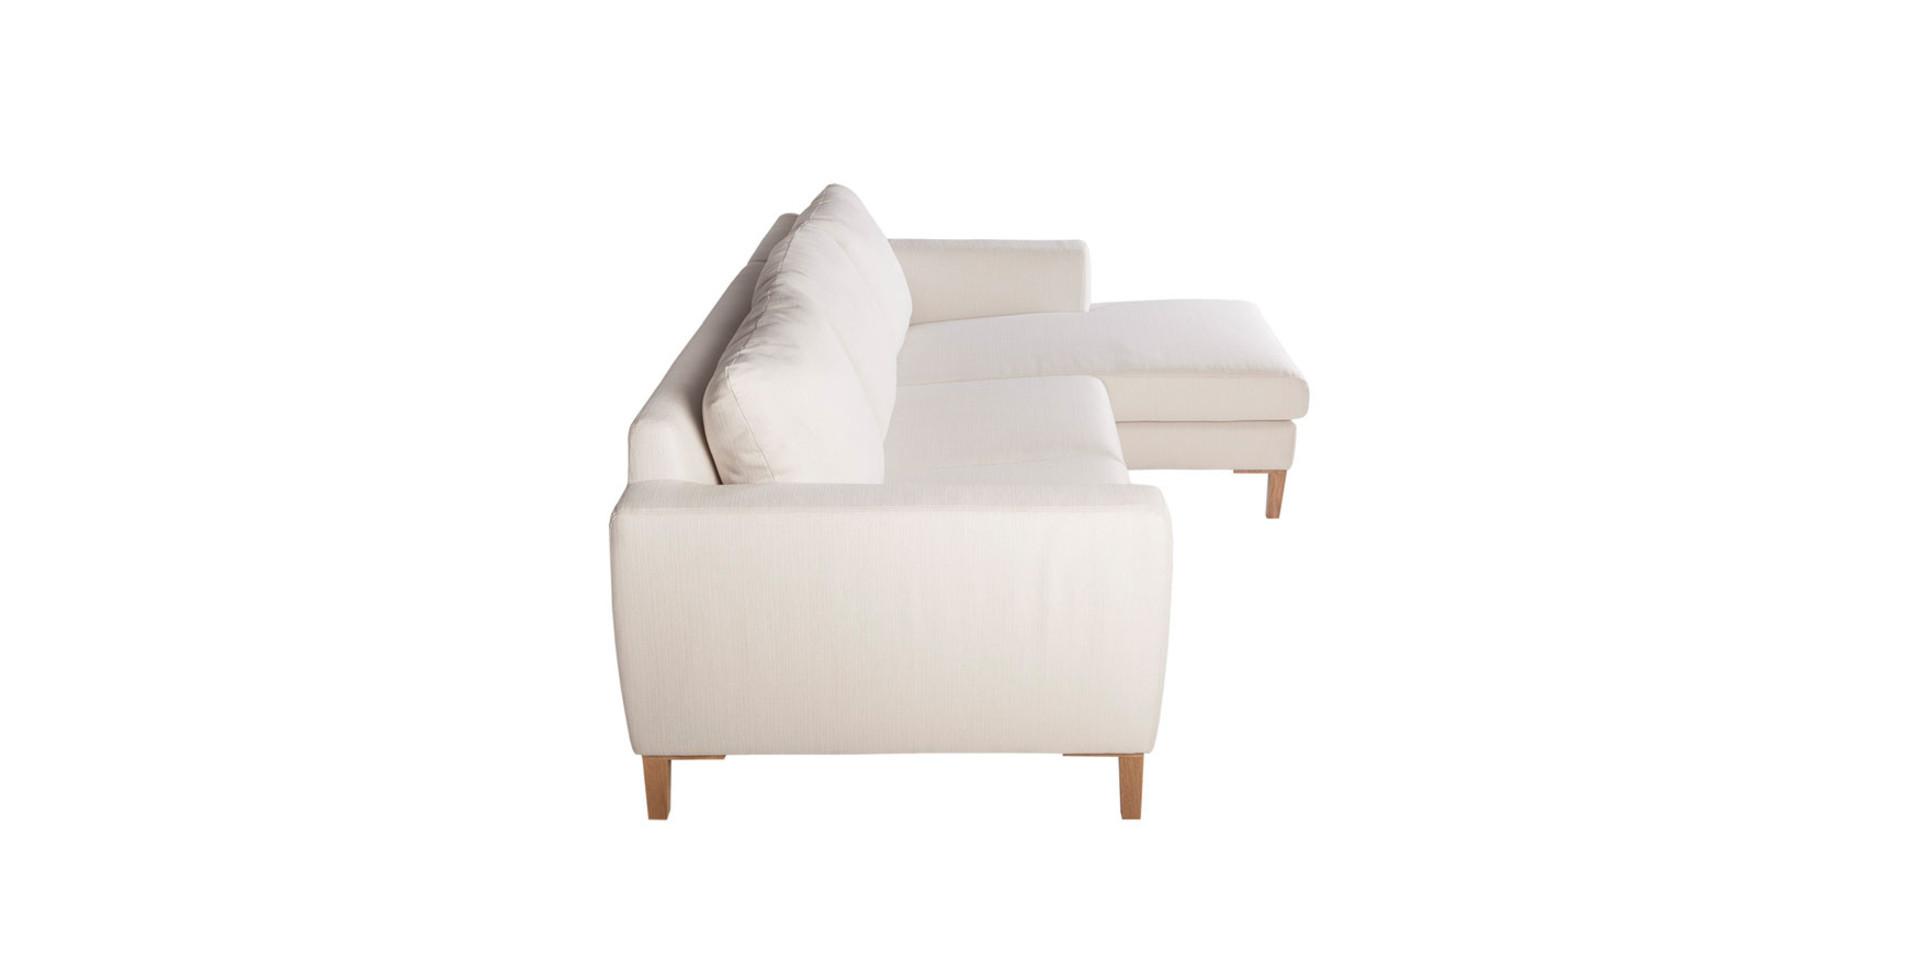 sits-malin-angle-set1_cedros1_white_4